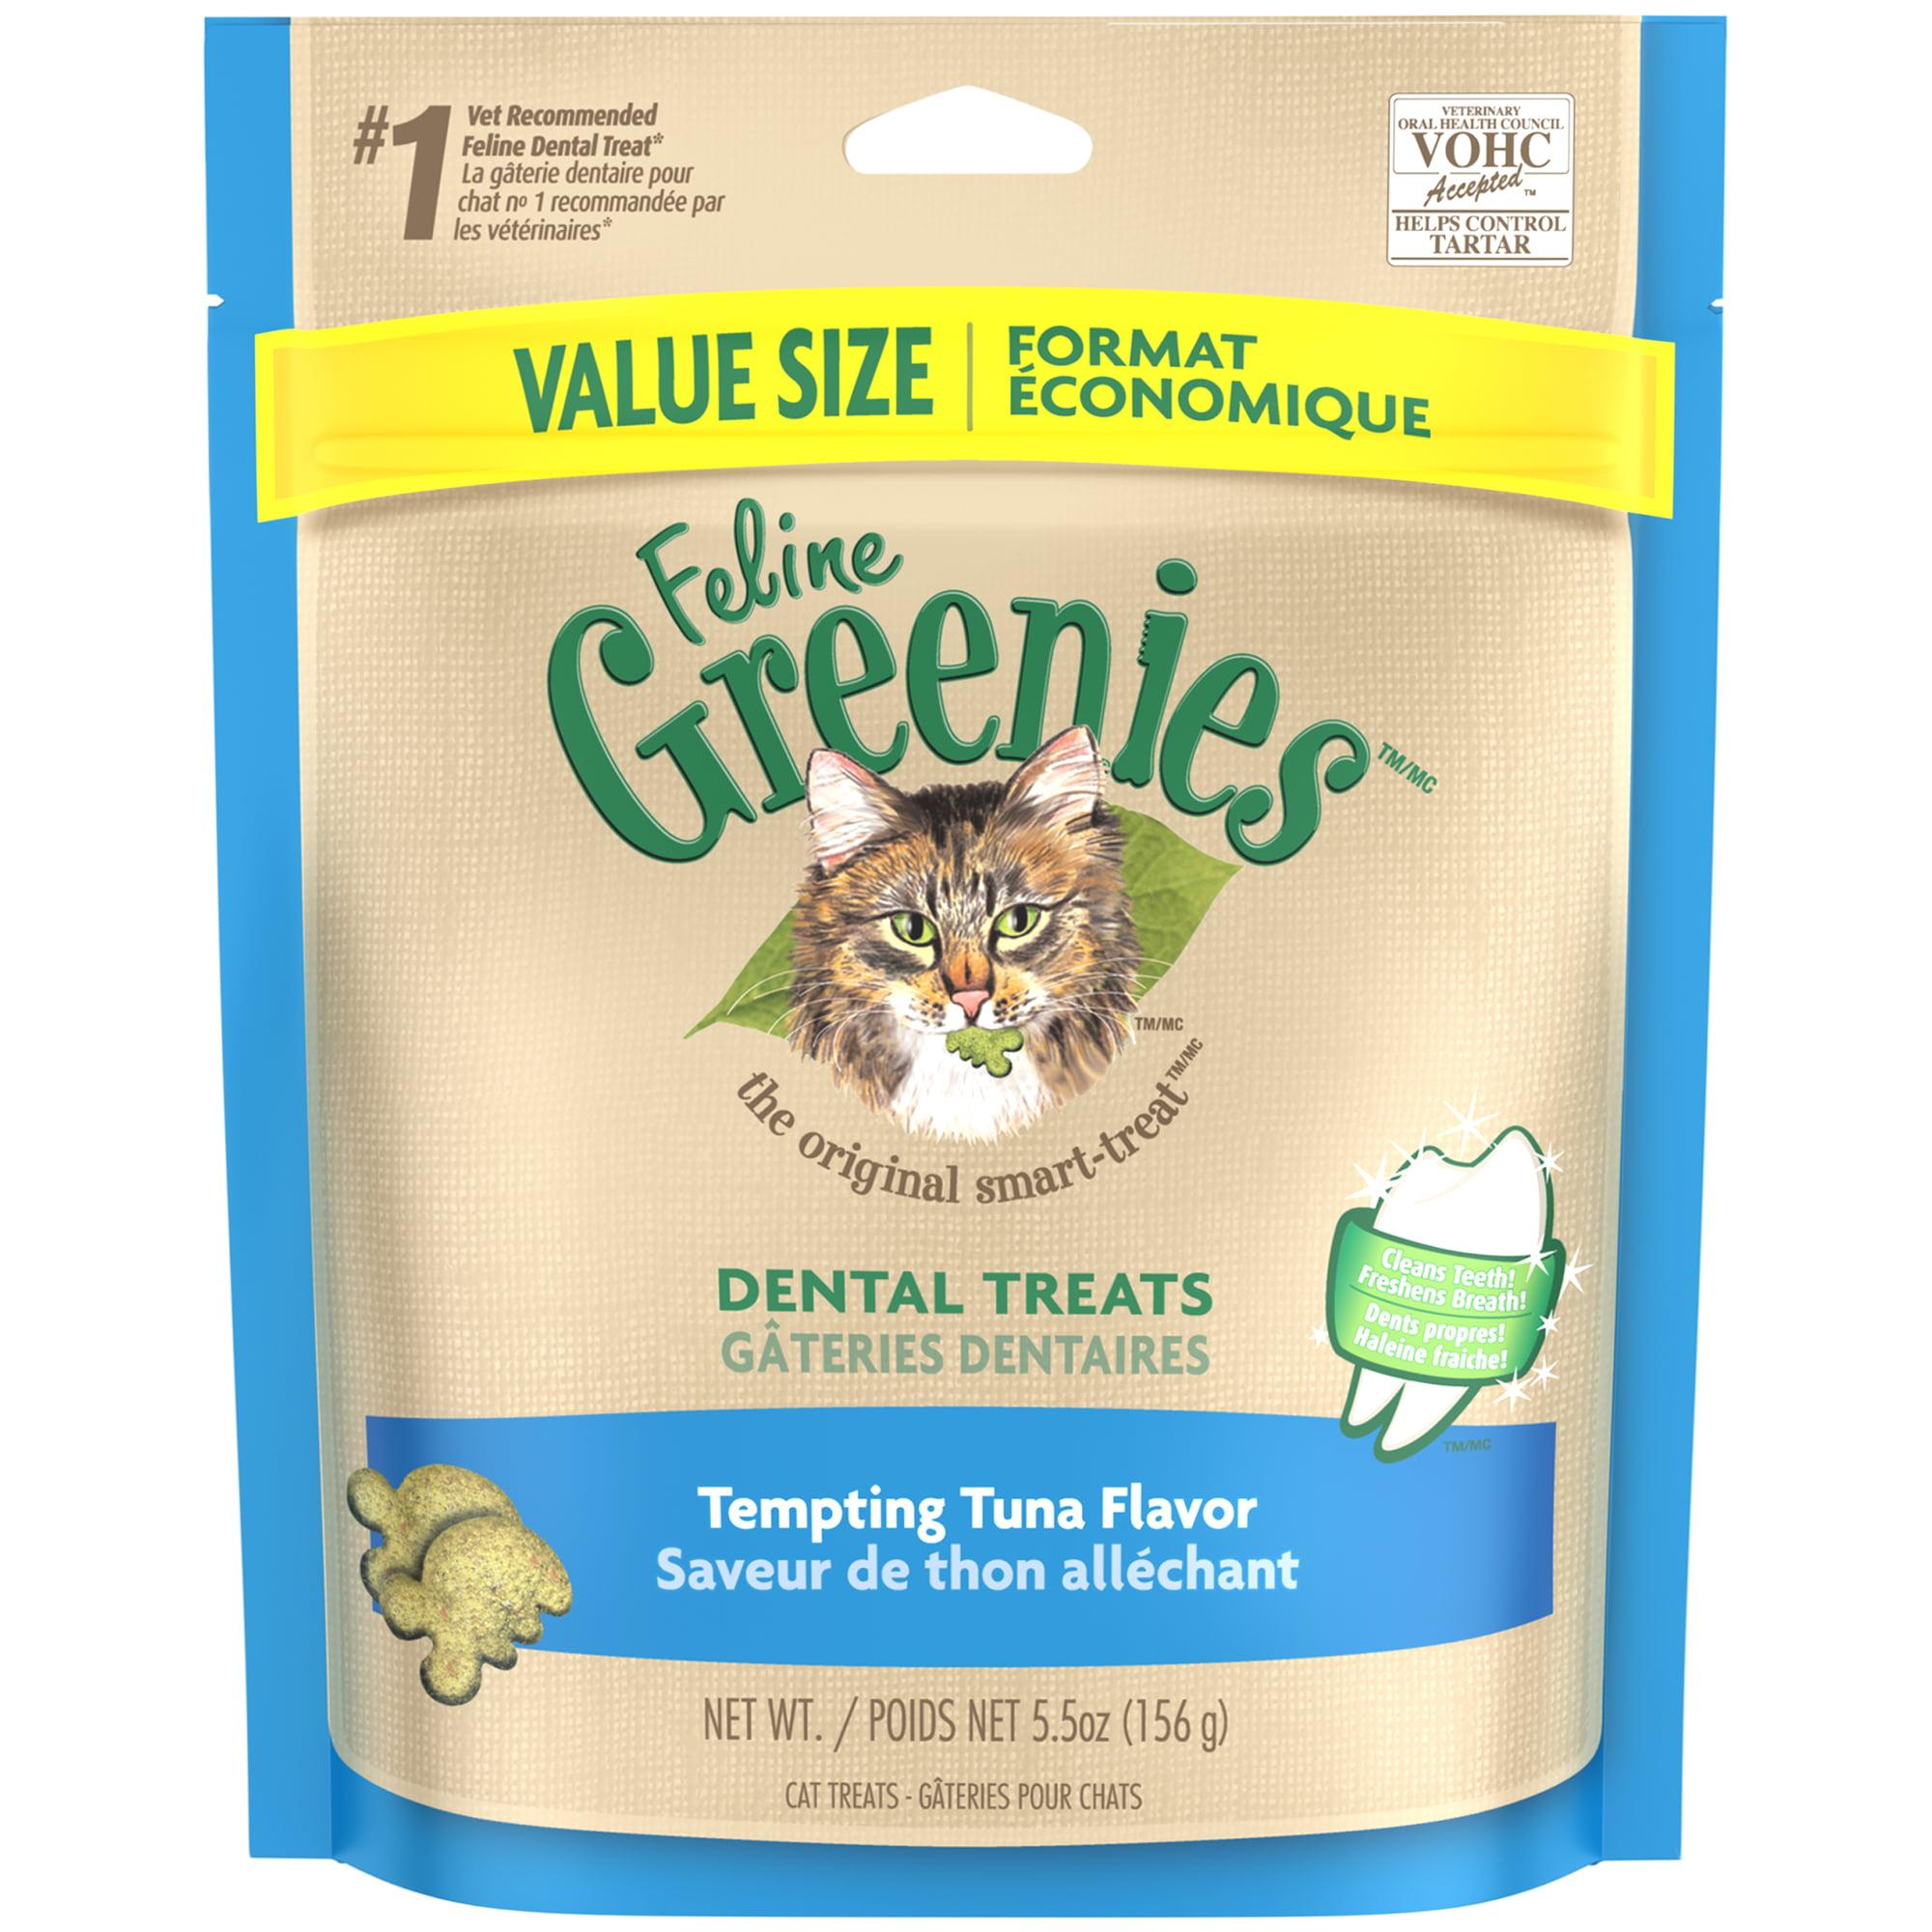 FELINE GREENIES Dental Cat Treats Tempting Tuna Flavor, 5.5 oz. Pouch